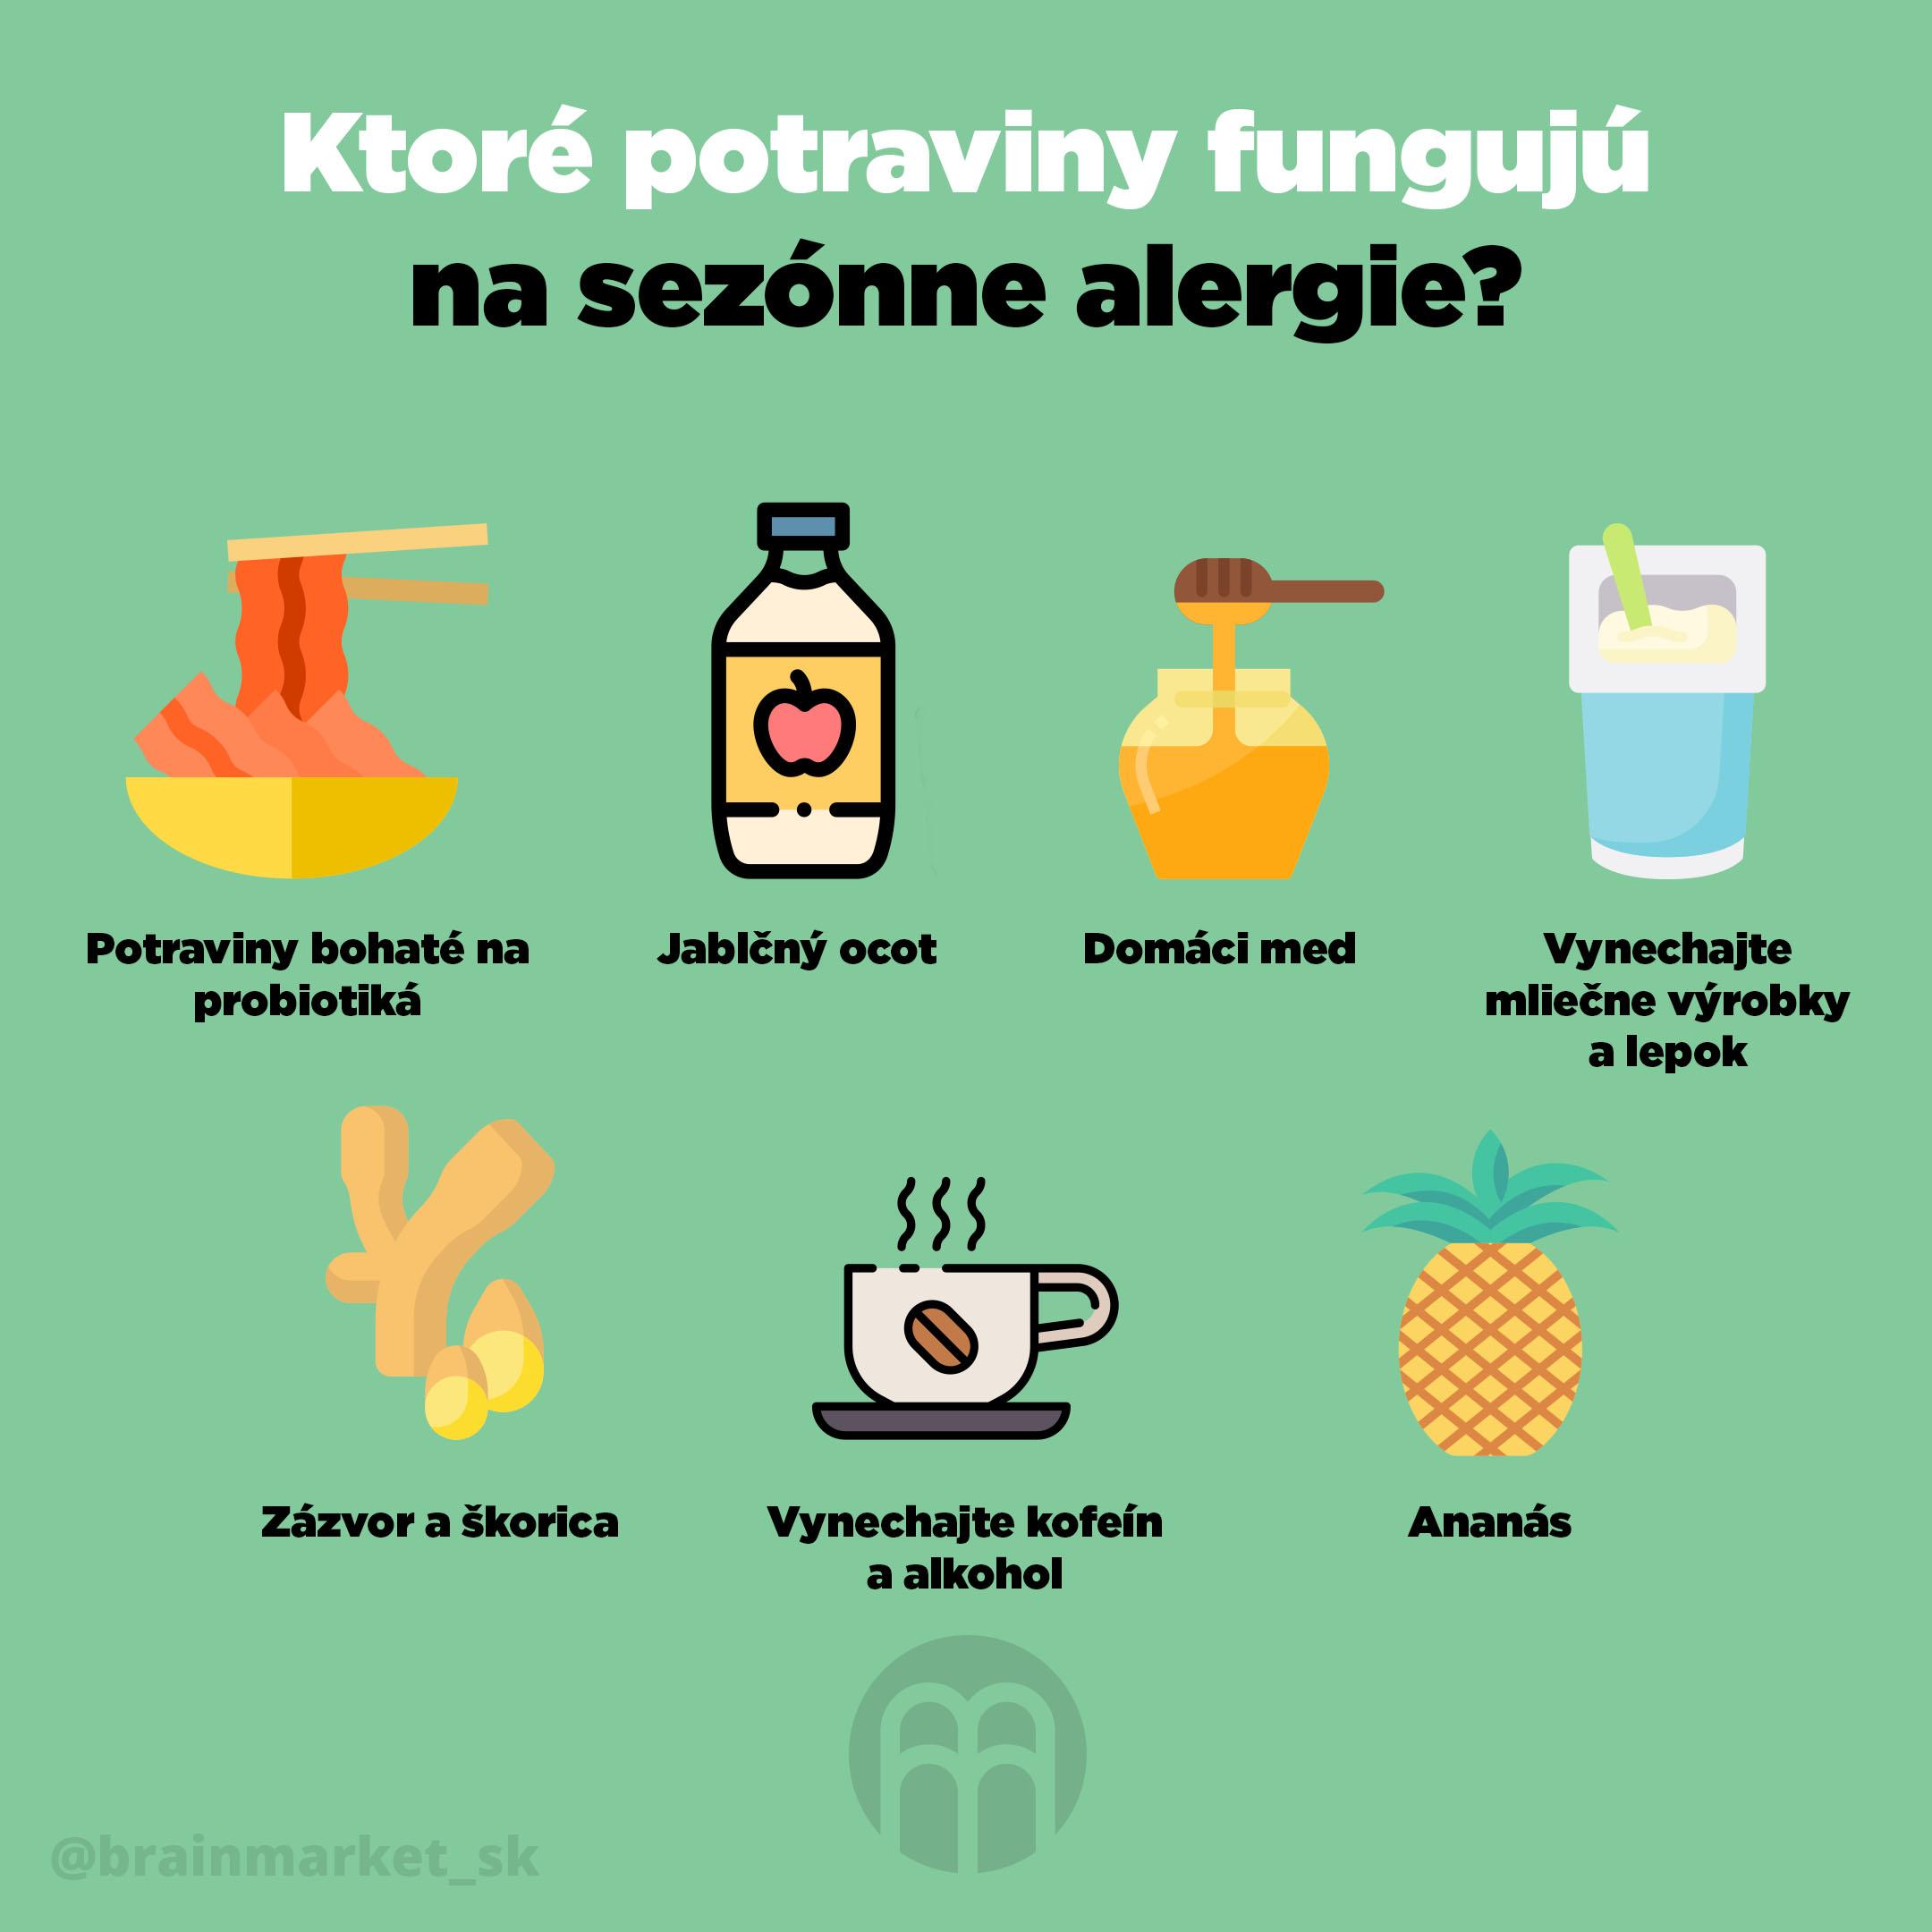 ktere_potraviny_na_sezonni_alergii_SK_Infografika_Instagram_BrainMarket